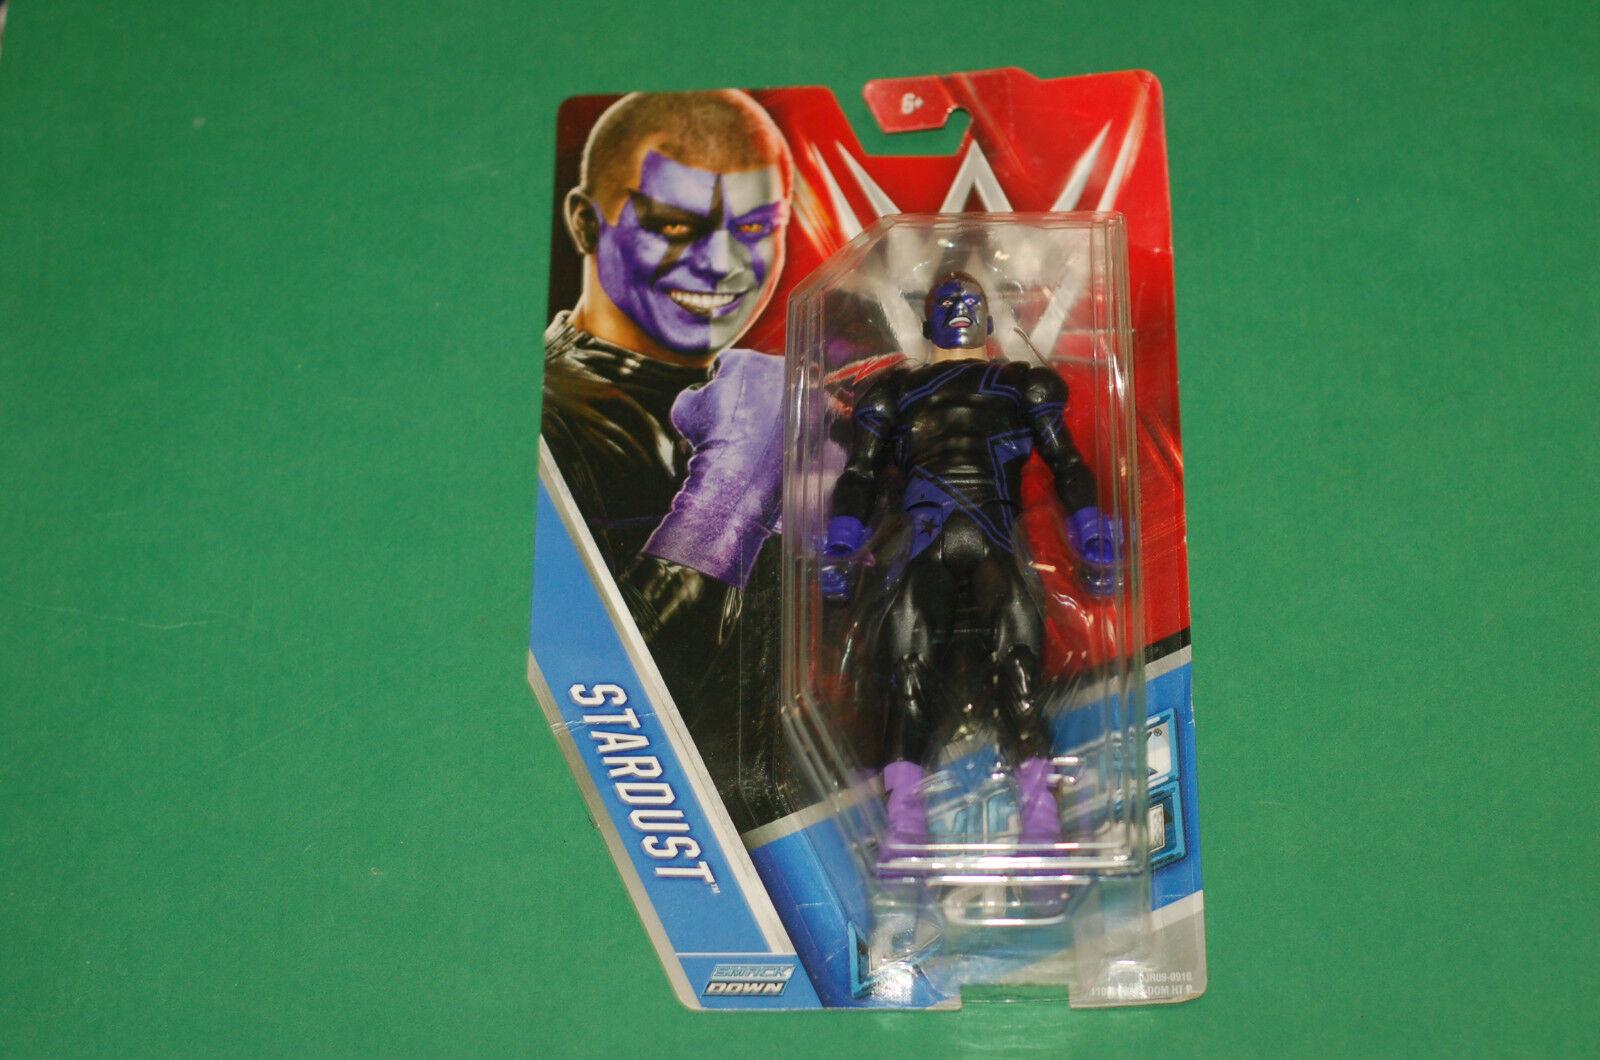 WWE WWF 58 Stardust purple attire basic wrestling figure figurine Mattel rare